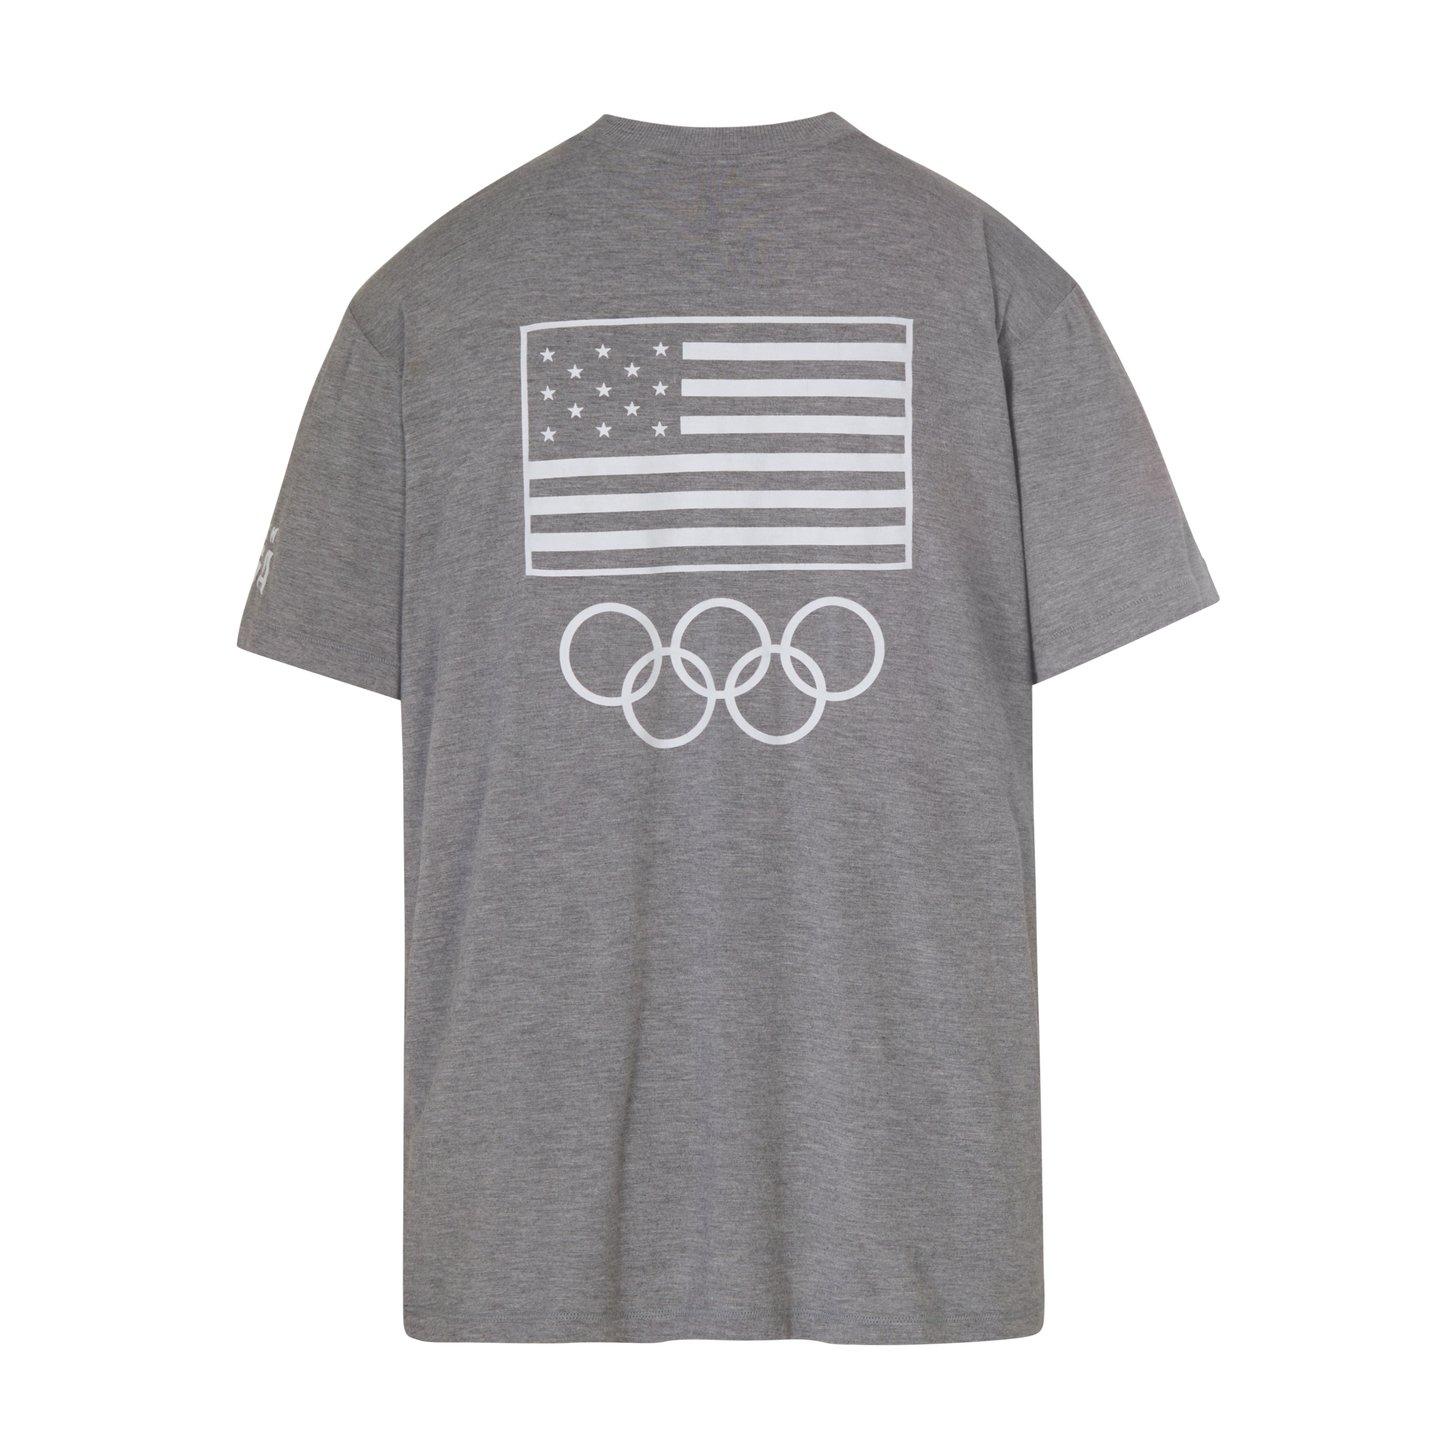 SKIMS Olympics shirt